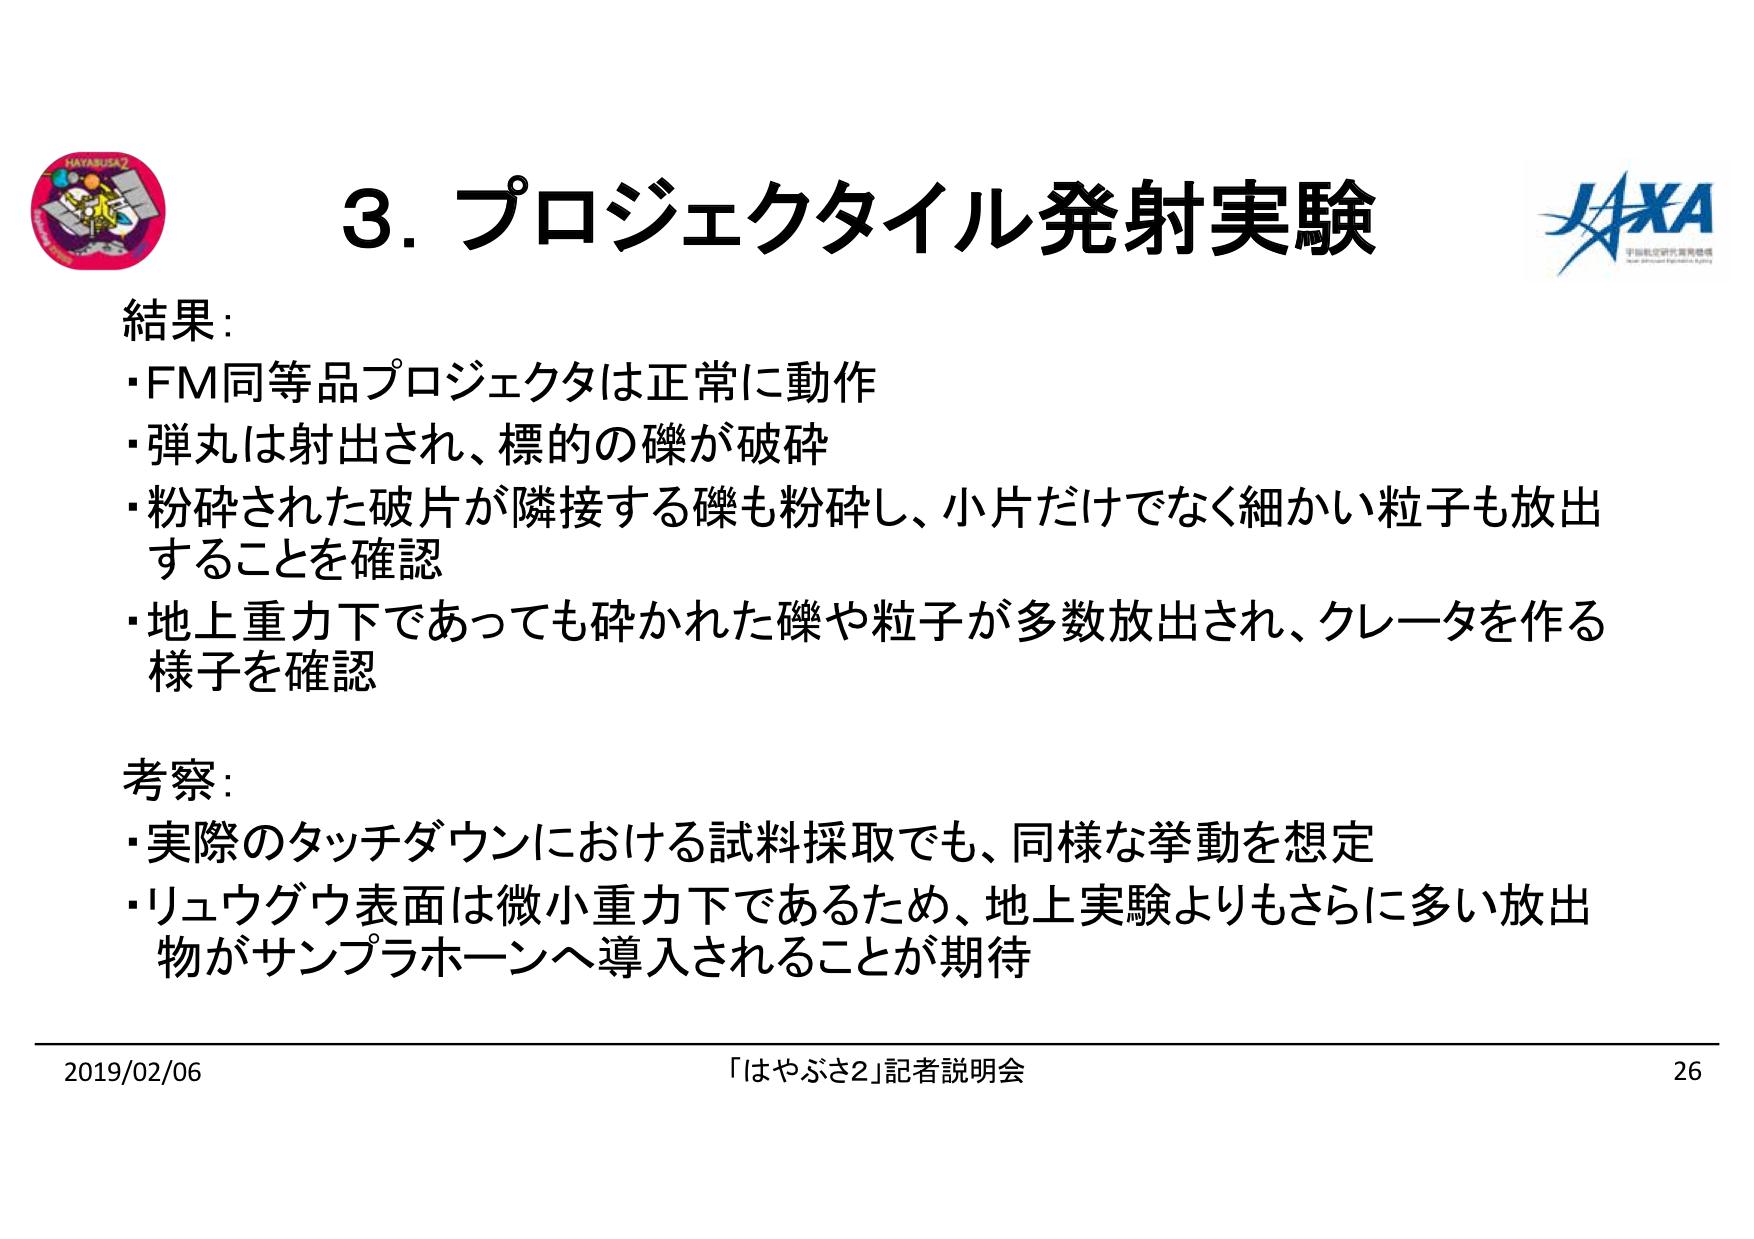 f:id:Imamura:20190204175520p:plain